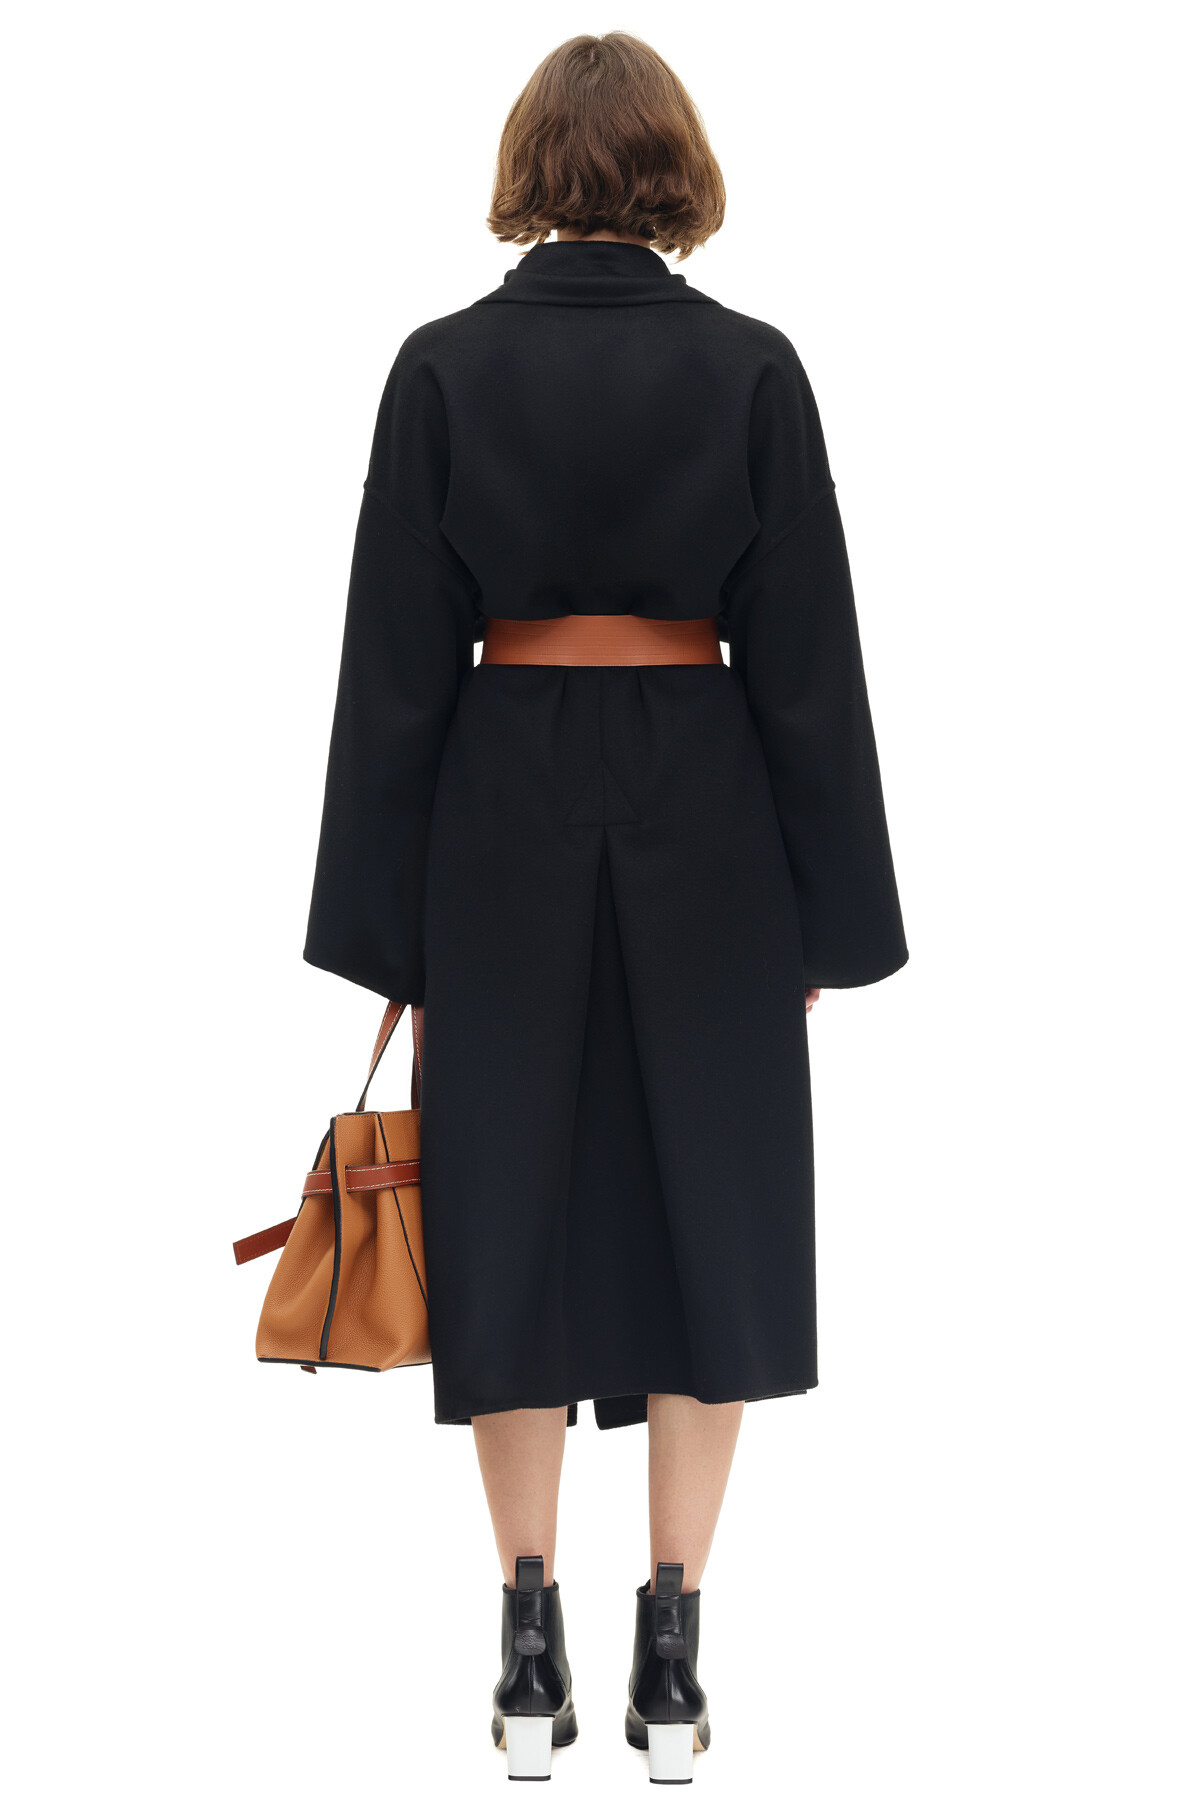 LOEWE Oversize Belted Coat 黑色 front